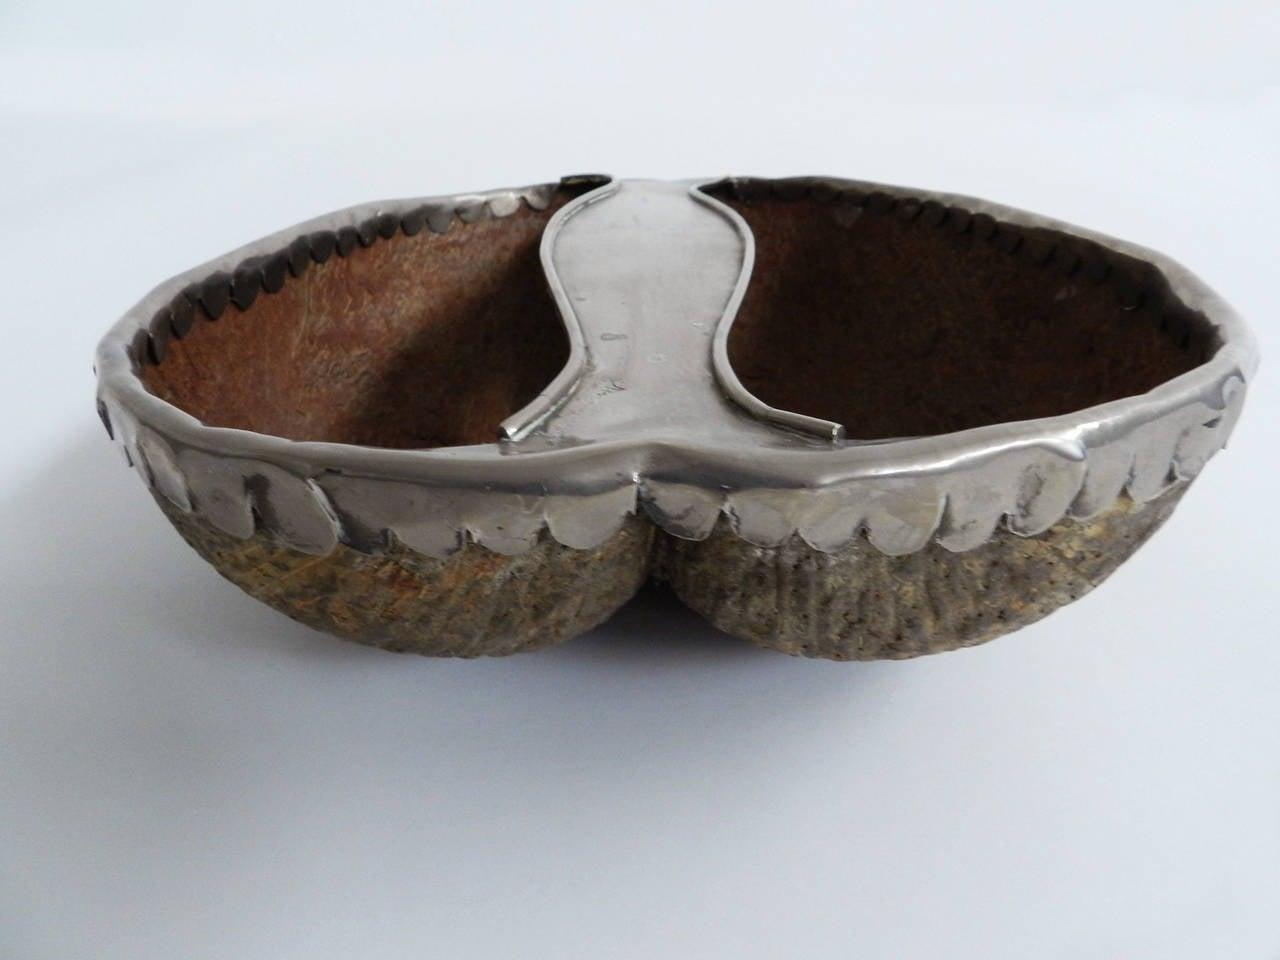 coconut bowls - photo #27